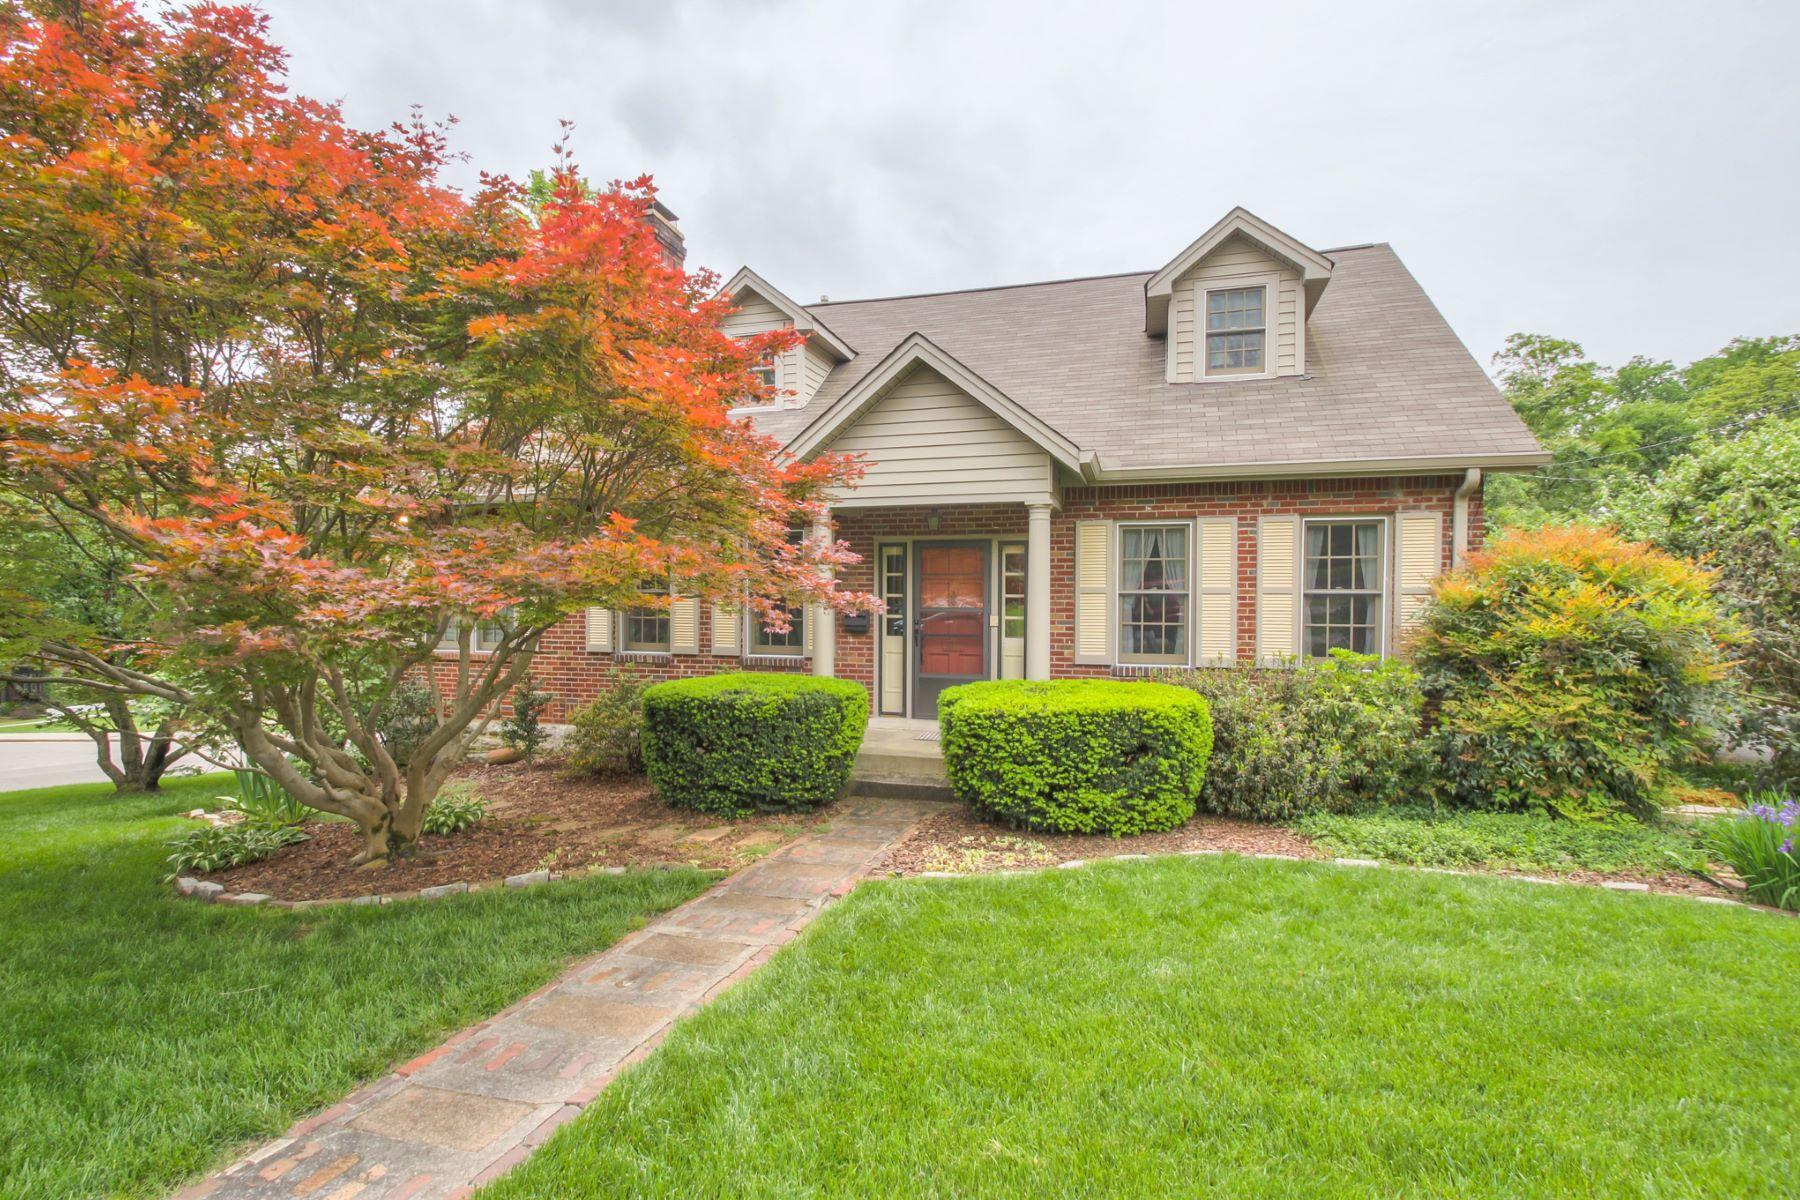 Casa Unifamiliar por un Venta en Boundless Cape Cod Home on Acklen 3201 Acklen Ave Nashville, Tennessee 37212 Estados Unidos